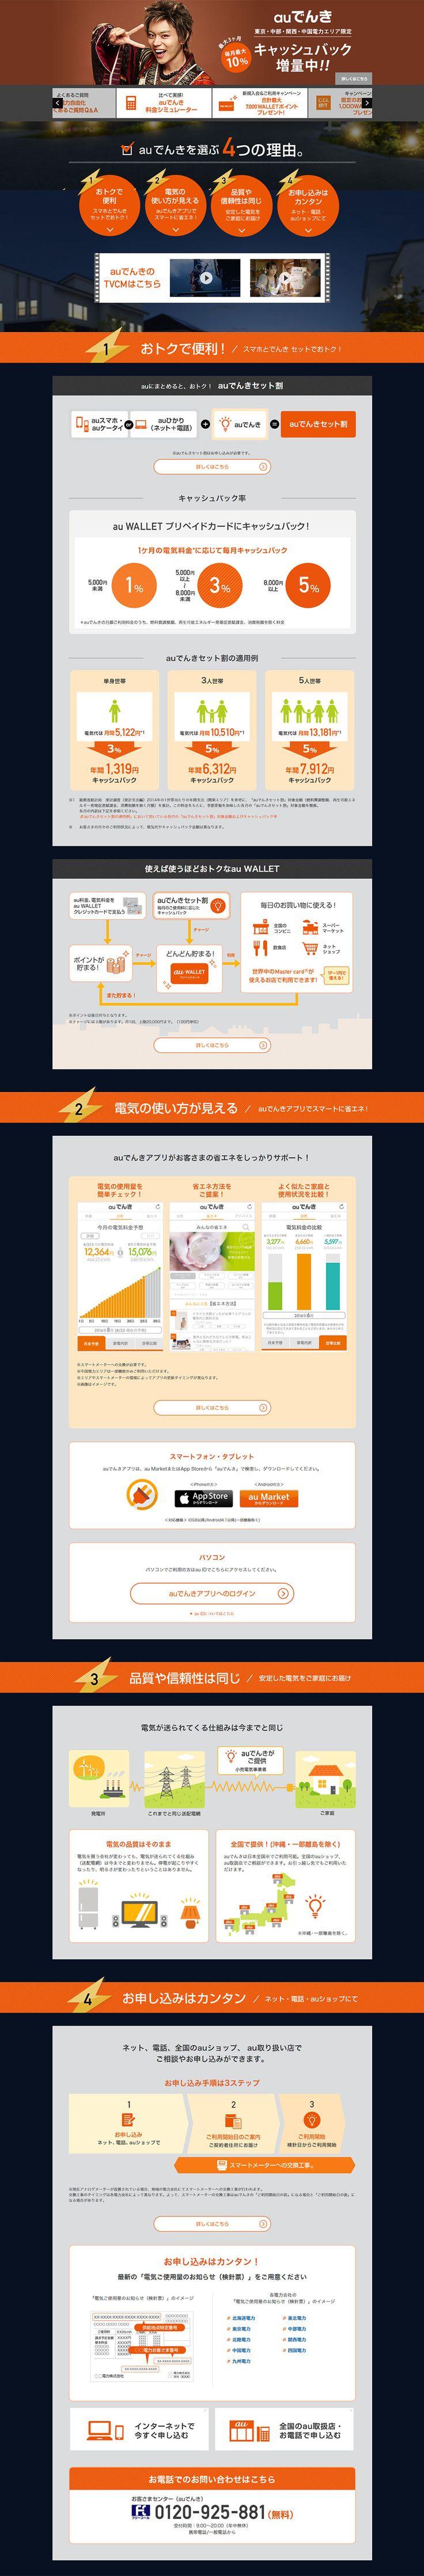 auでんき【家電・パソコン・通信関連】のLPデザイン。WEBデザイナーさん必見!ランディングページのデザイン参考に(シンプル系)